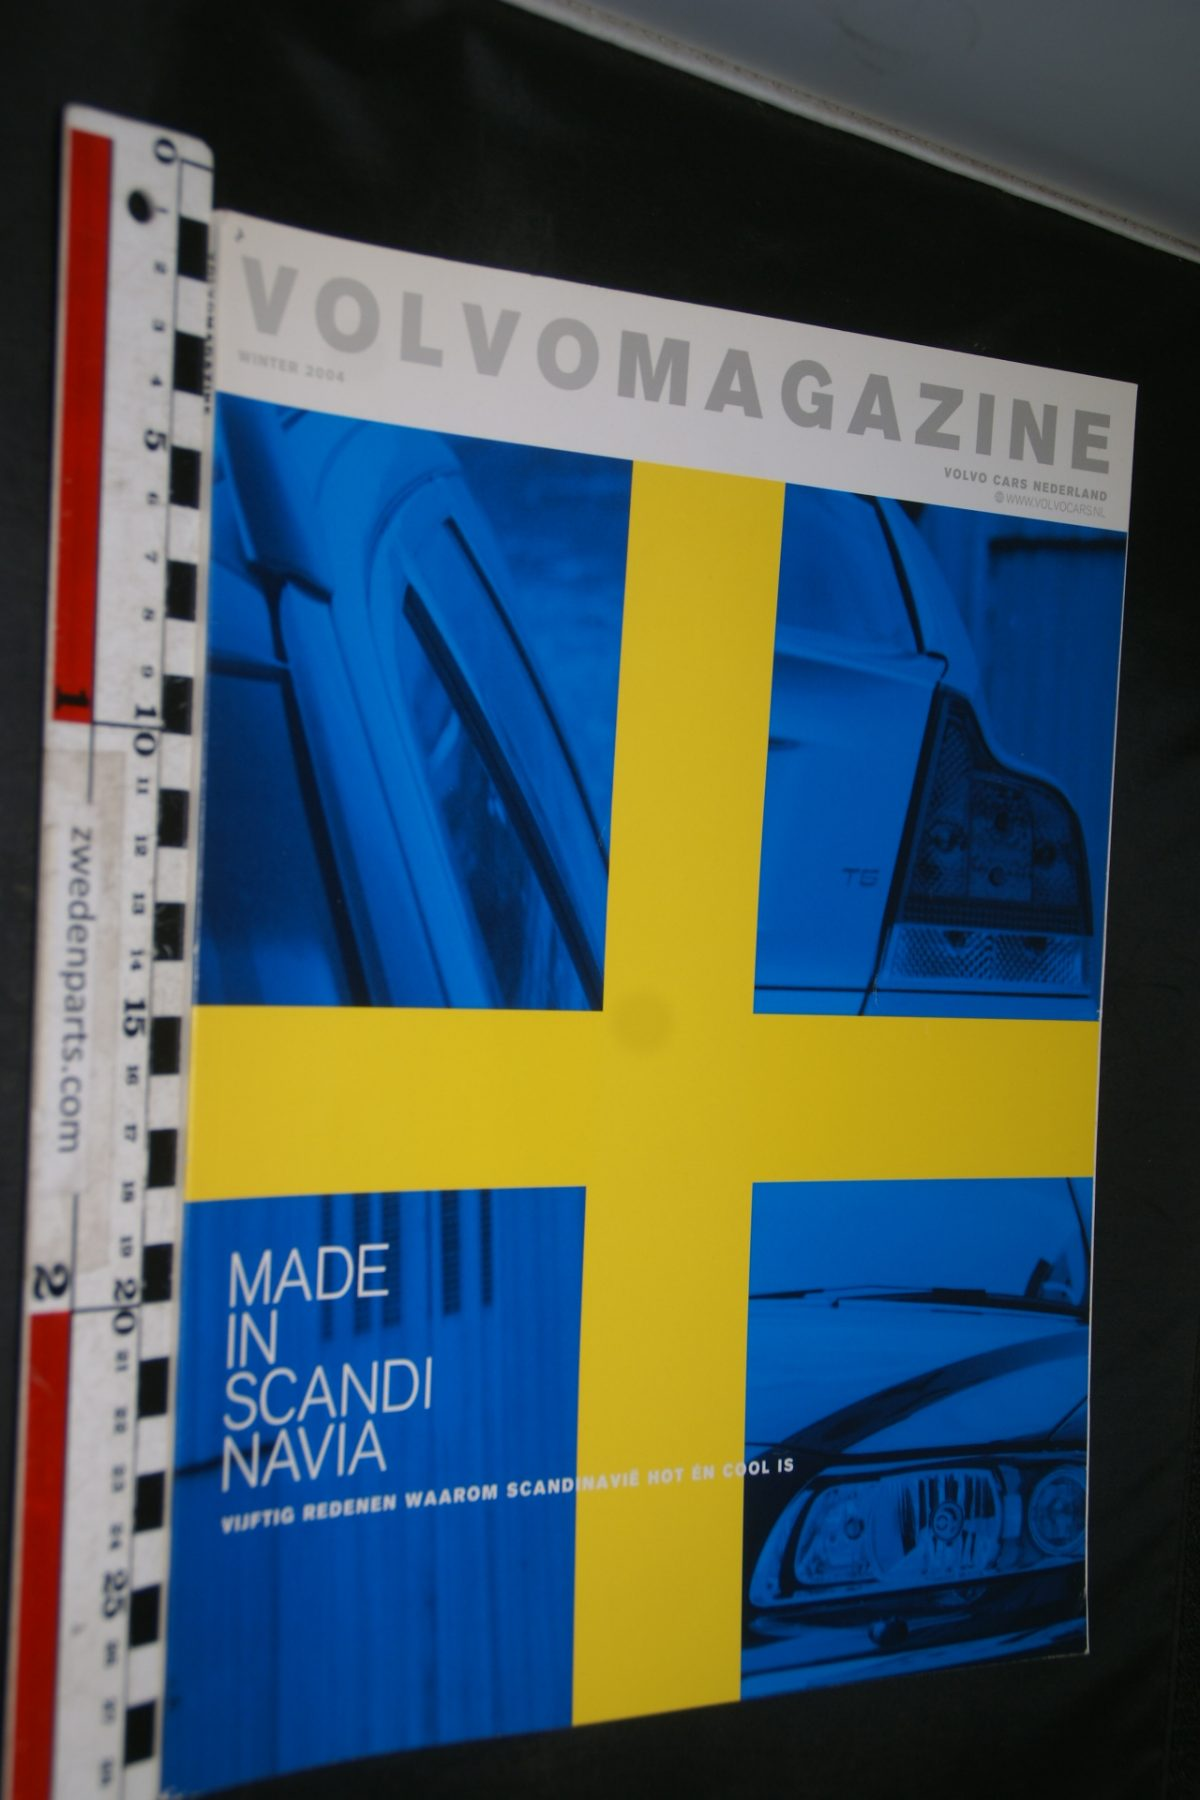 DSC04192 2004 winter tijdschrift Volvomagazine Scandinavia